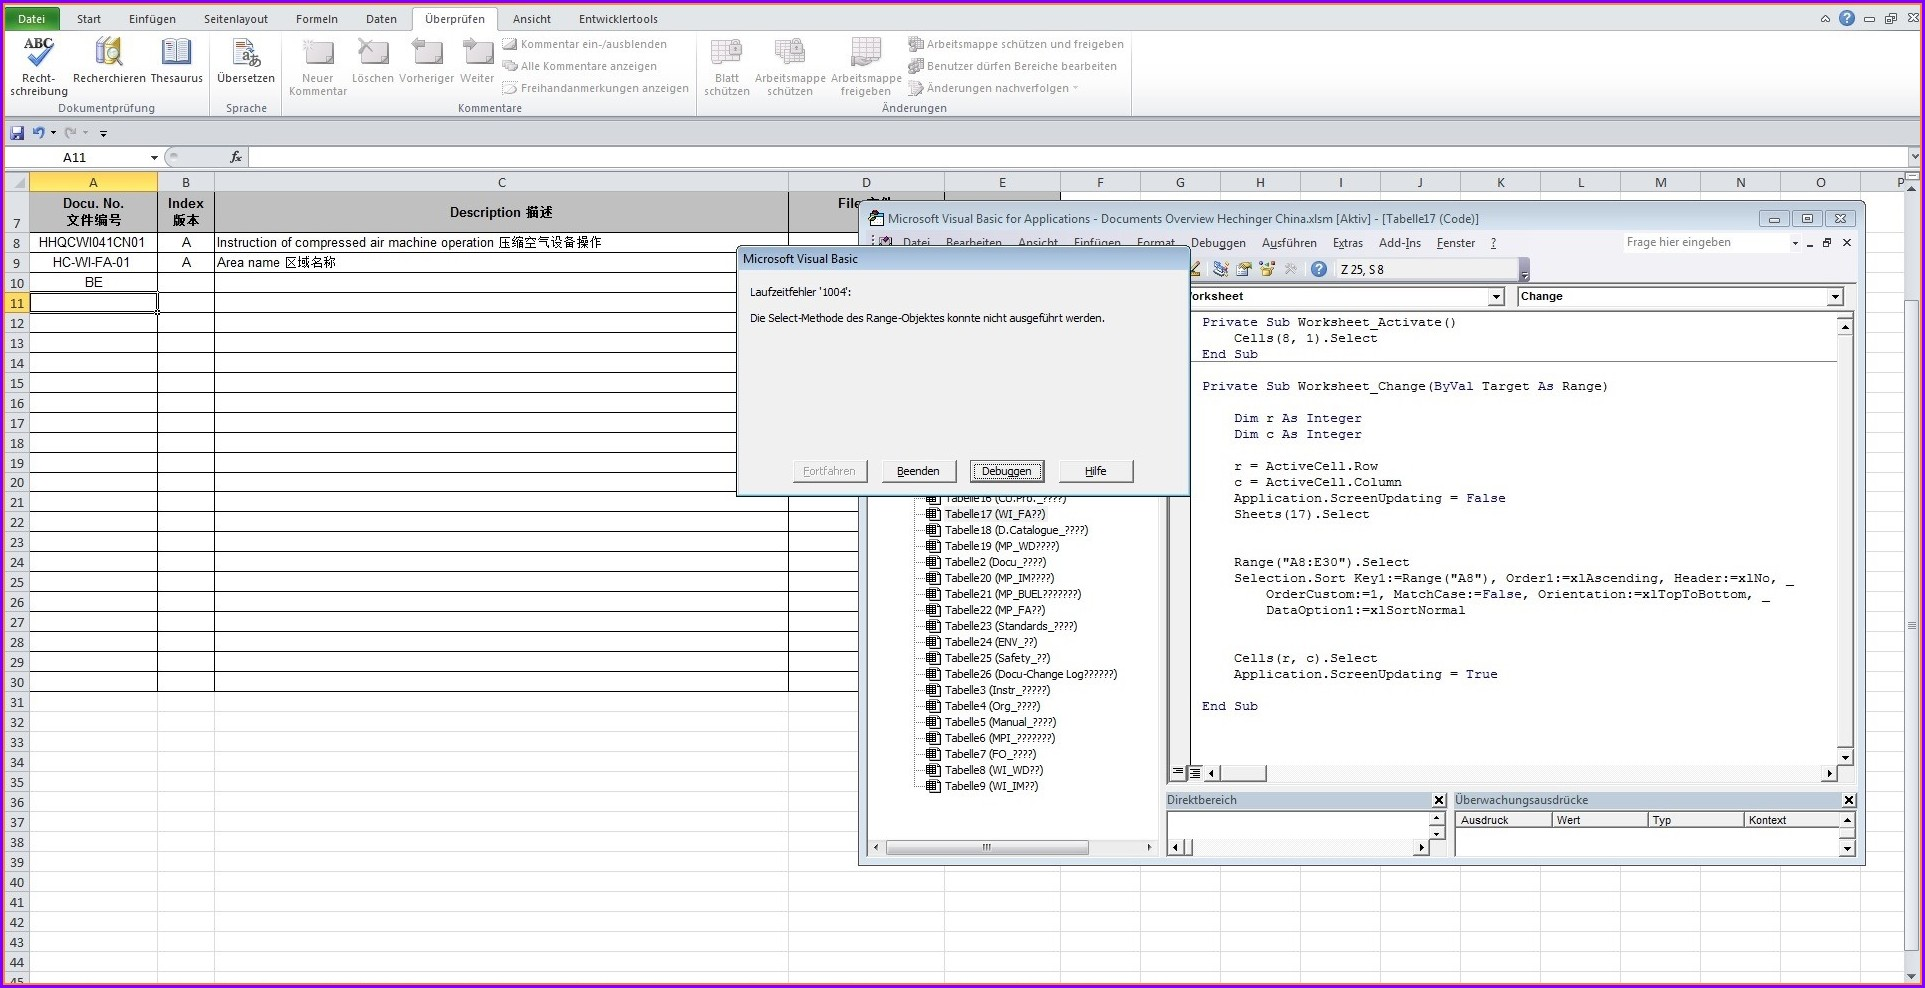 Excel Vba Sort Sheet Column